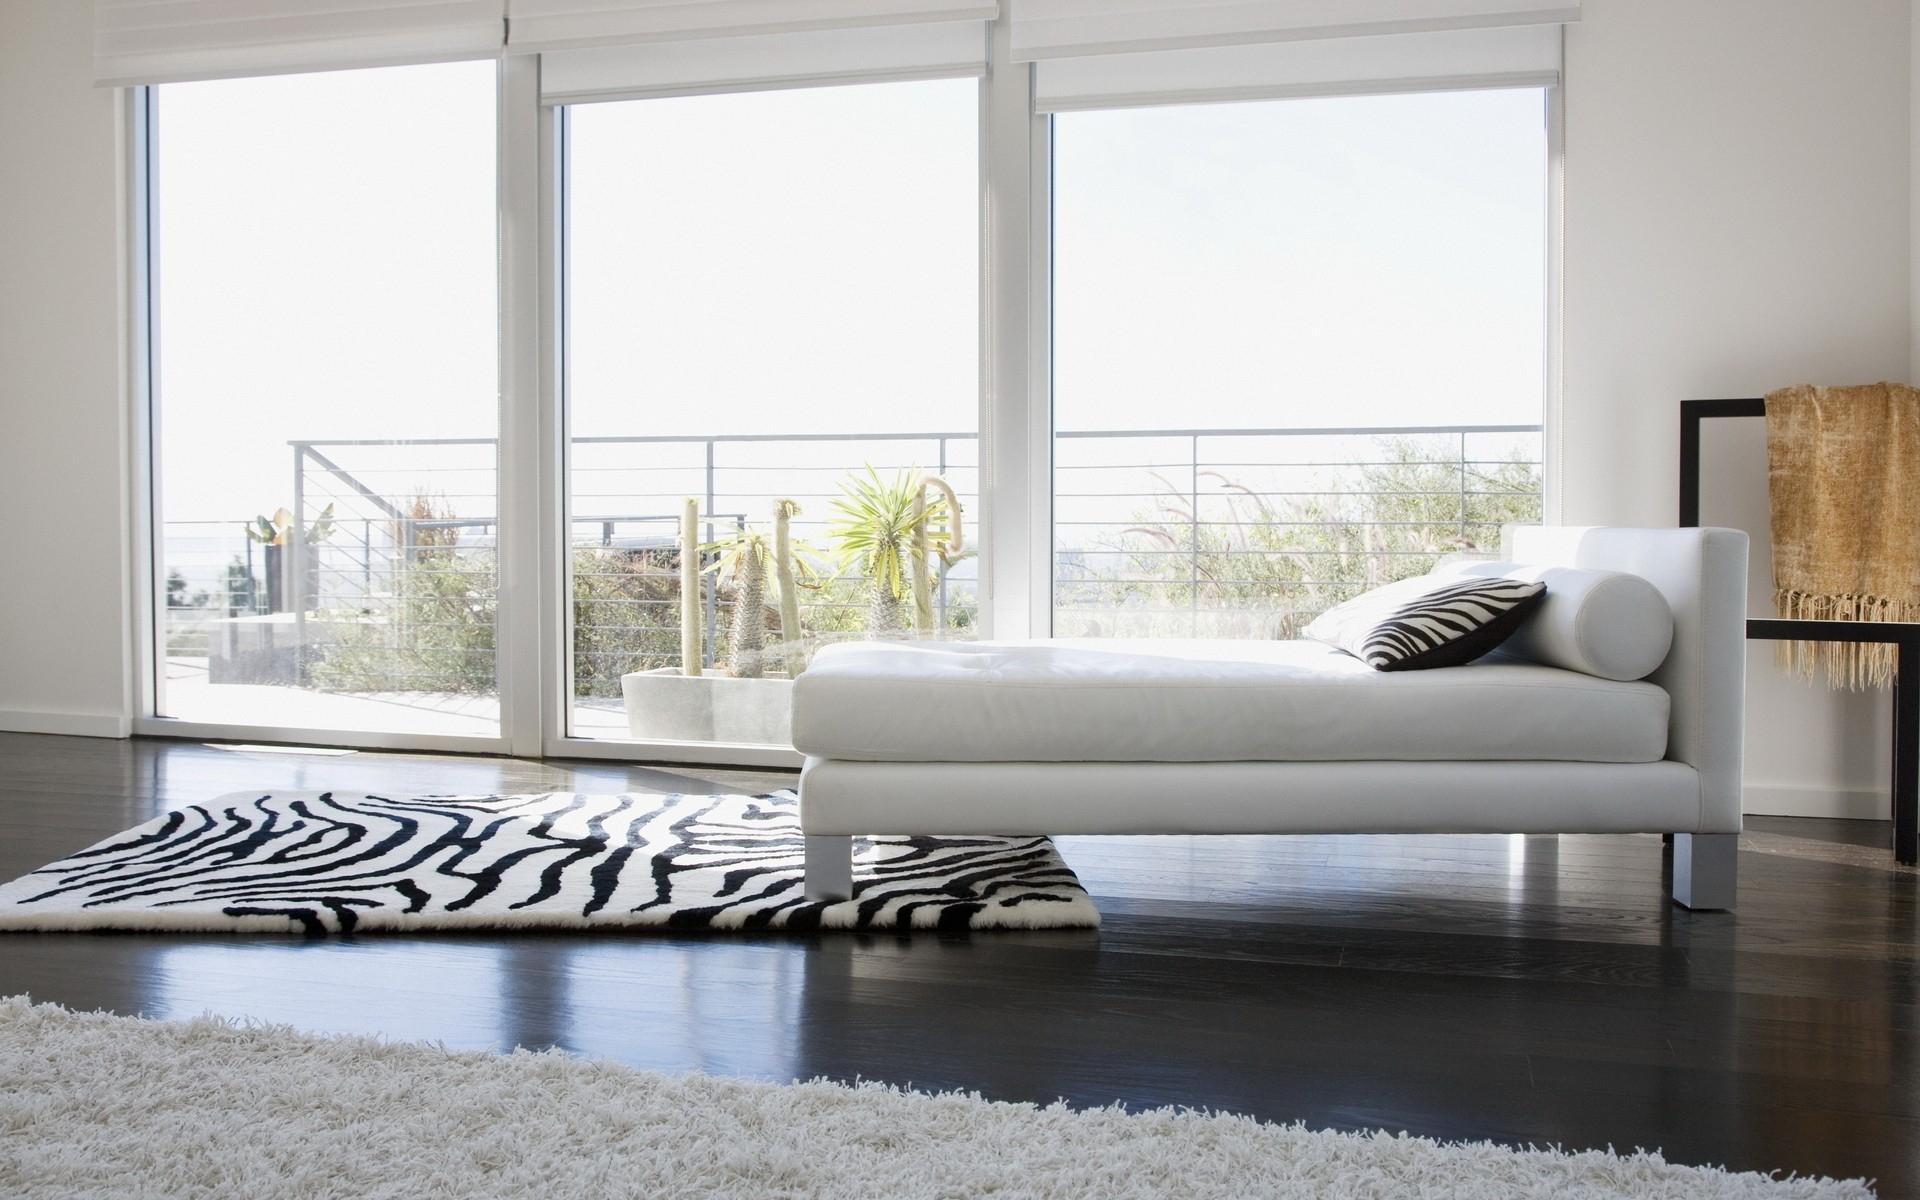 Hintergrundbilder : Fenster, Zimmer, Innere, Bett, Holz, Couch ...